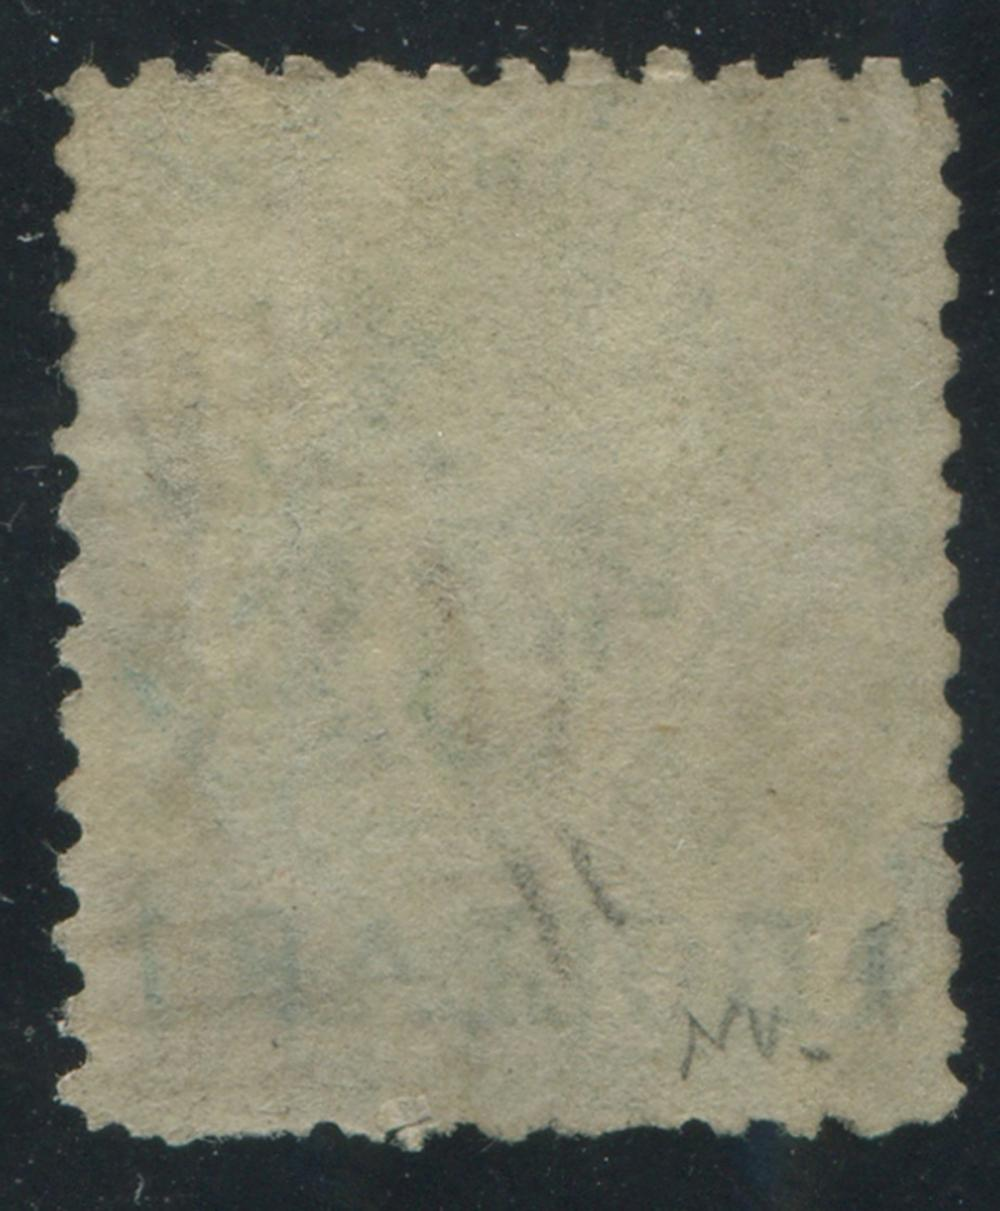 British Columbia 1869 #18 $1 on 3d Green